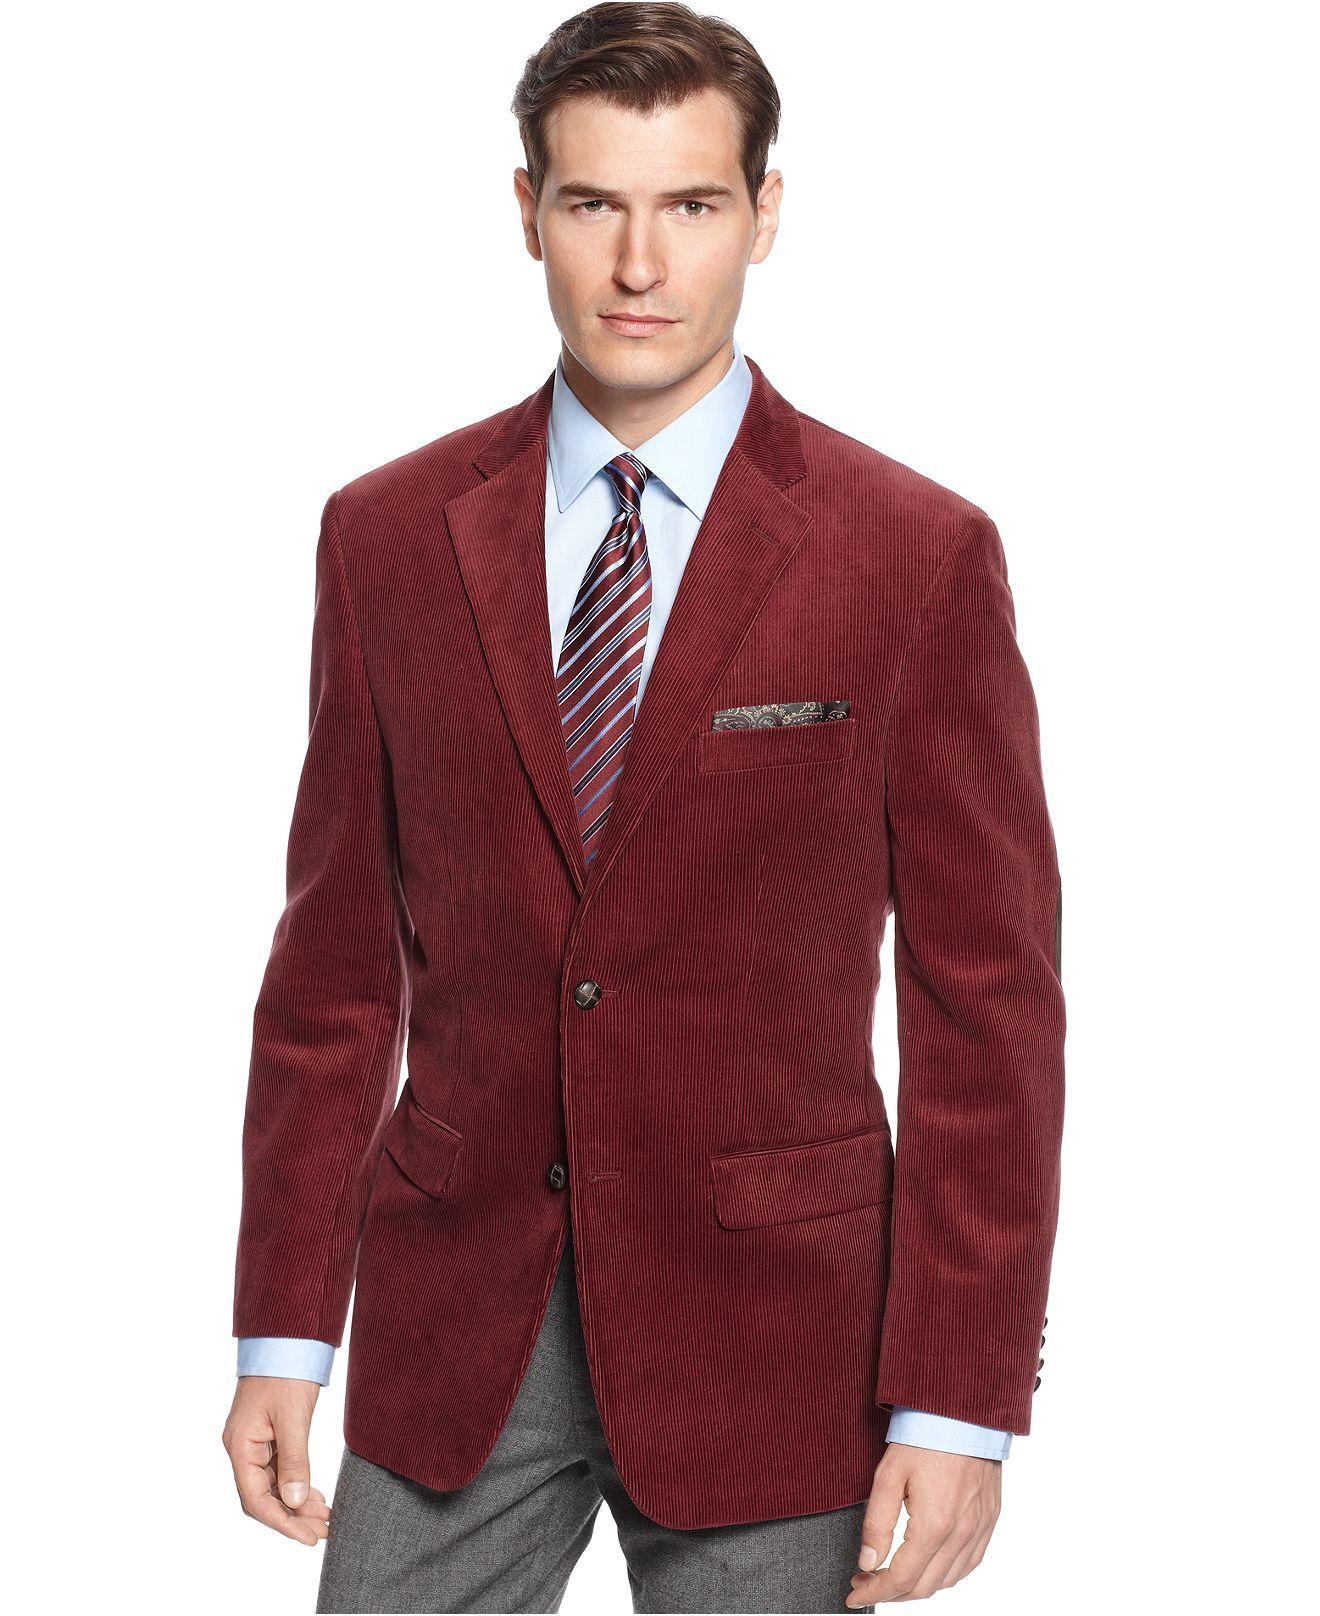 Tasso Elba Jacket, Solid Corduroy Blazer - Blazers & Sport Coats ...